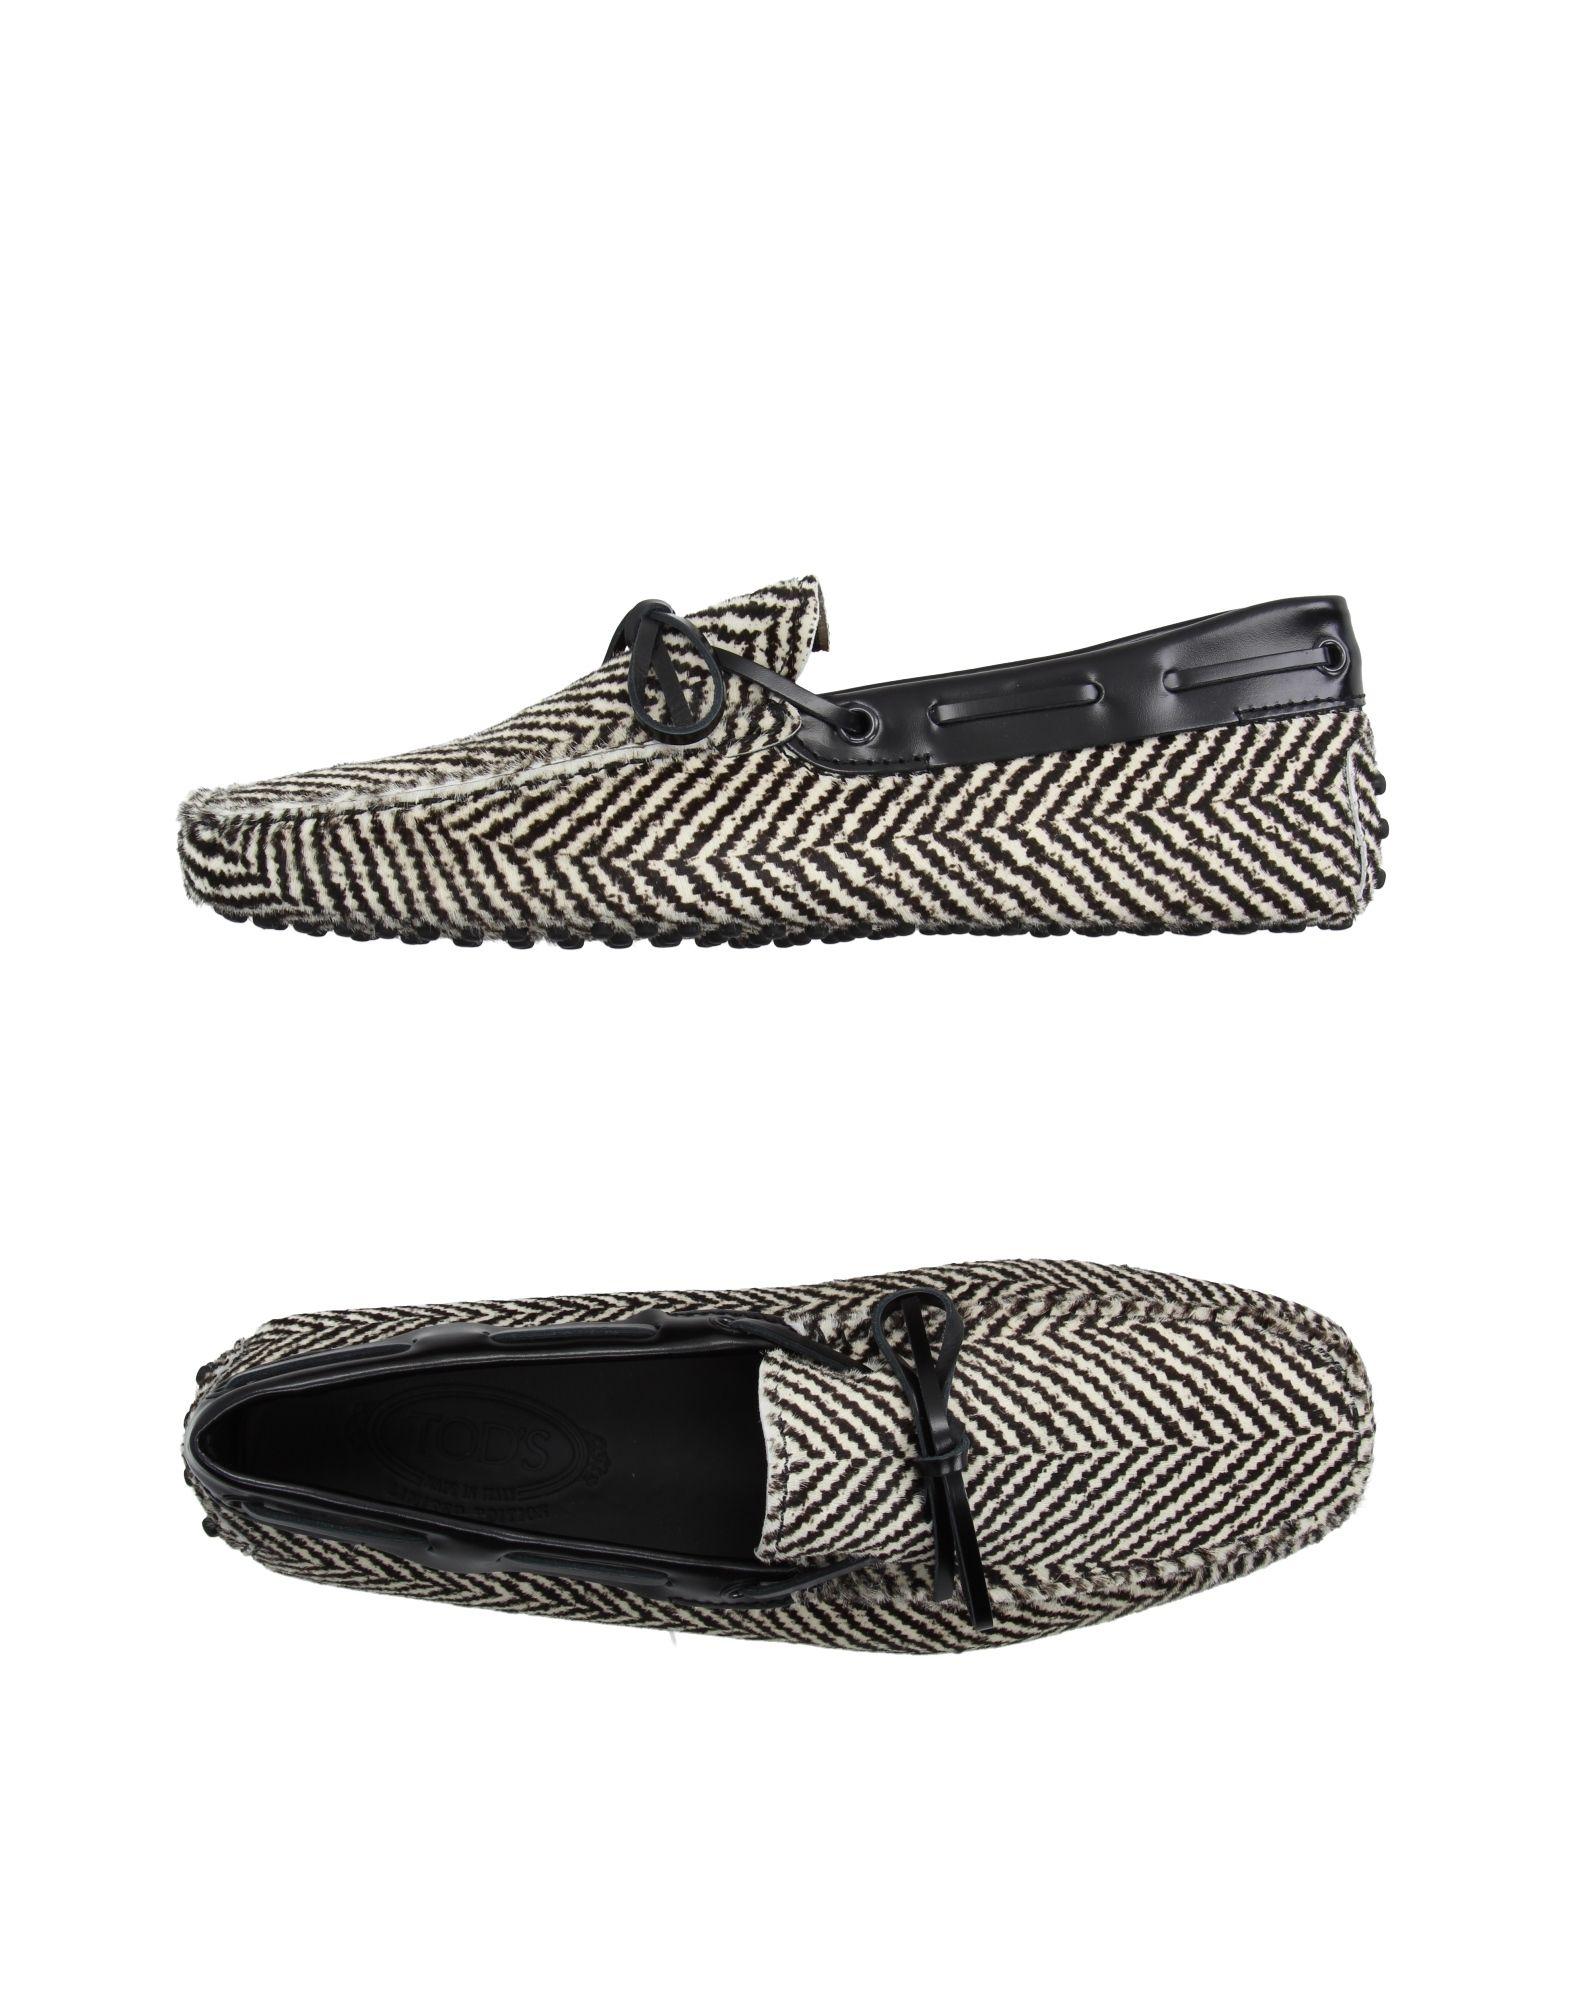 Tod's Mokassins Herren  11087986CU Gute Qualität beliebte Schuhe